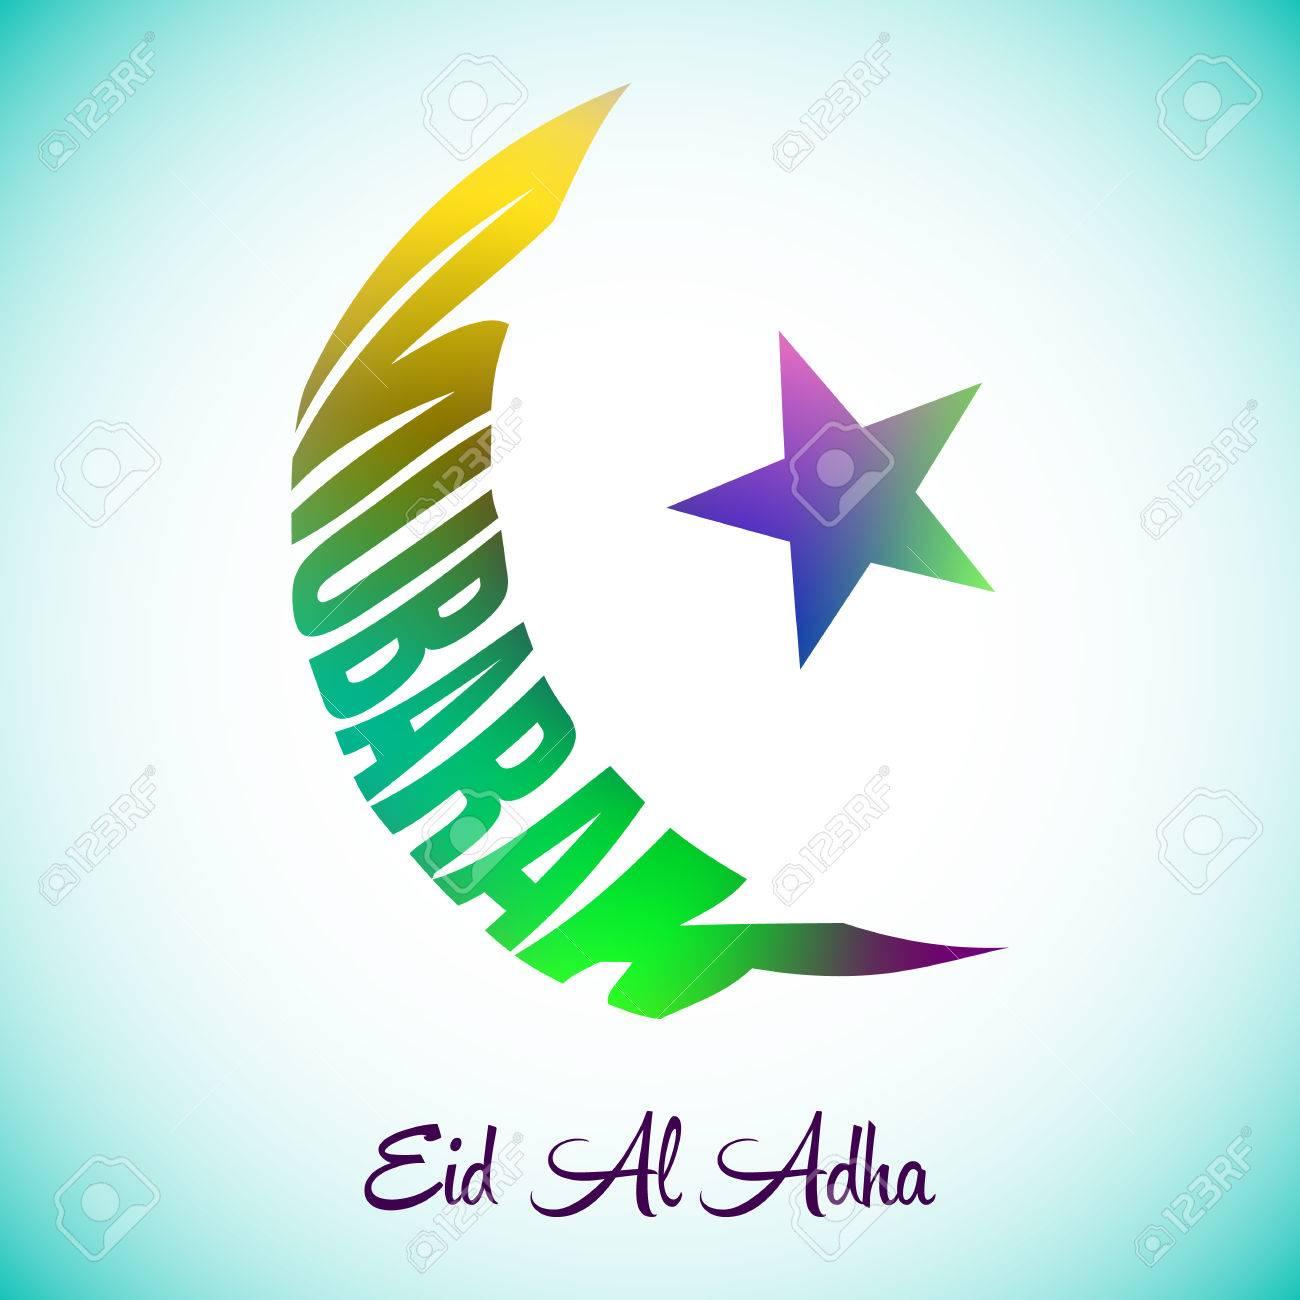 Vector illustration with eid al adha mubarak greeting card vector vector illustration with eid al adha mubarak greeting card backgroundlamic half moon mubarak colorful lettering background m4hsunfo